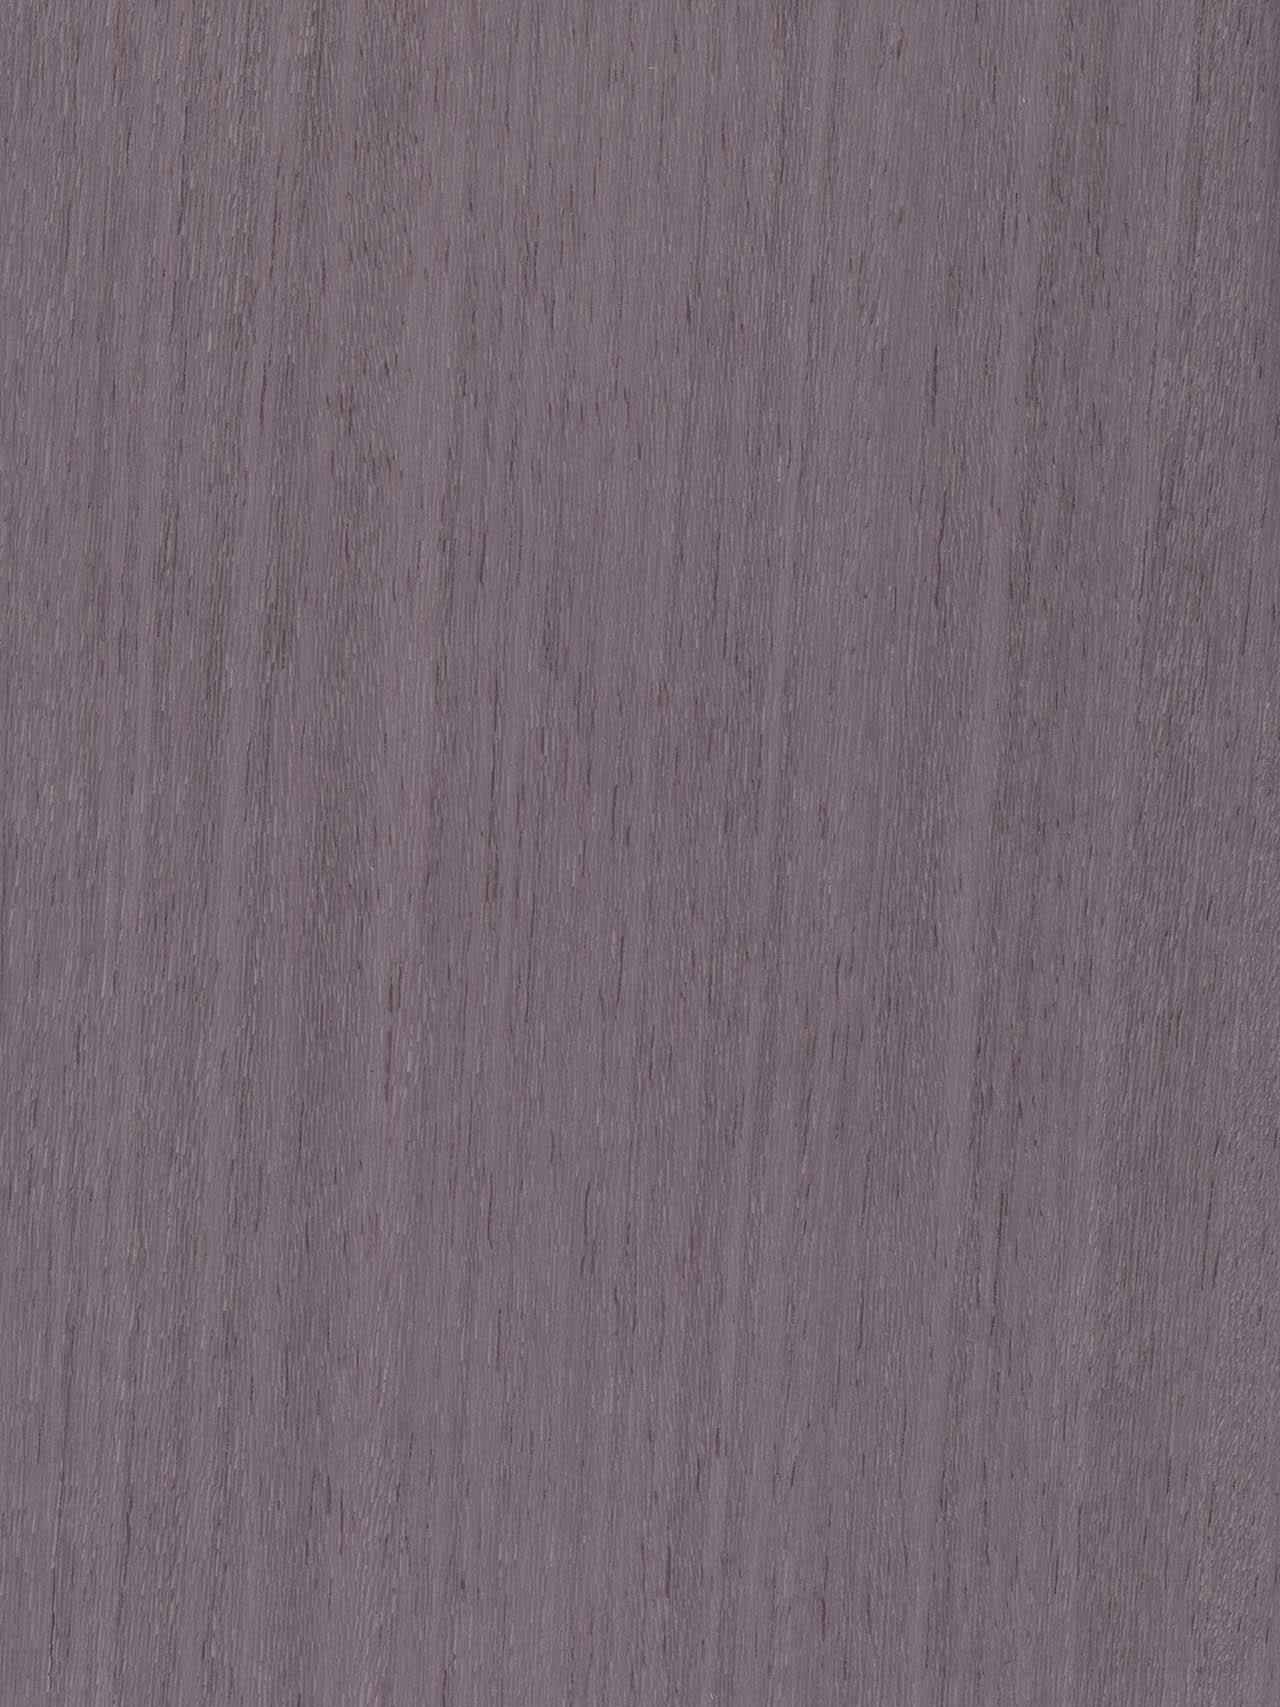 Chapa madera Koto Amaranto RBF 109 Losán